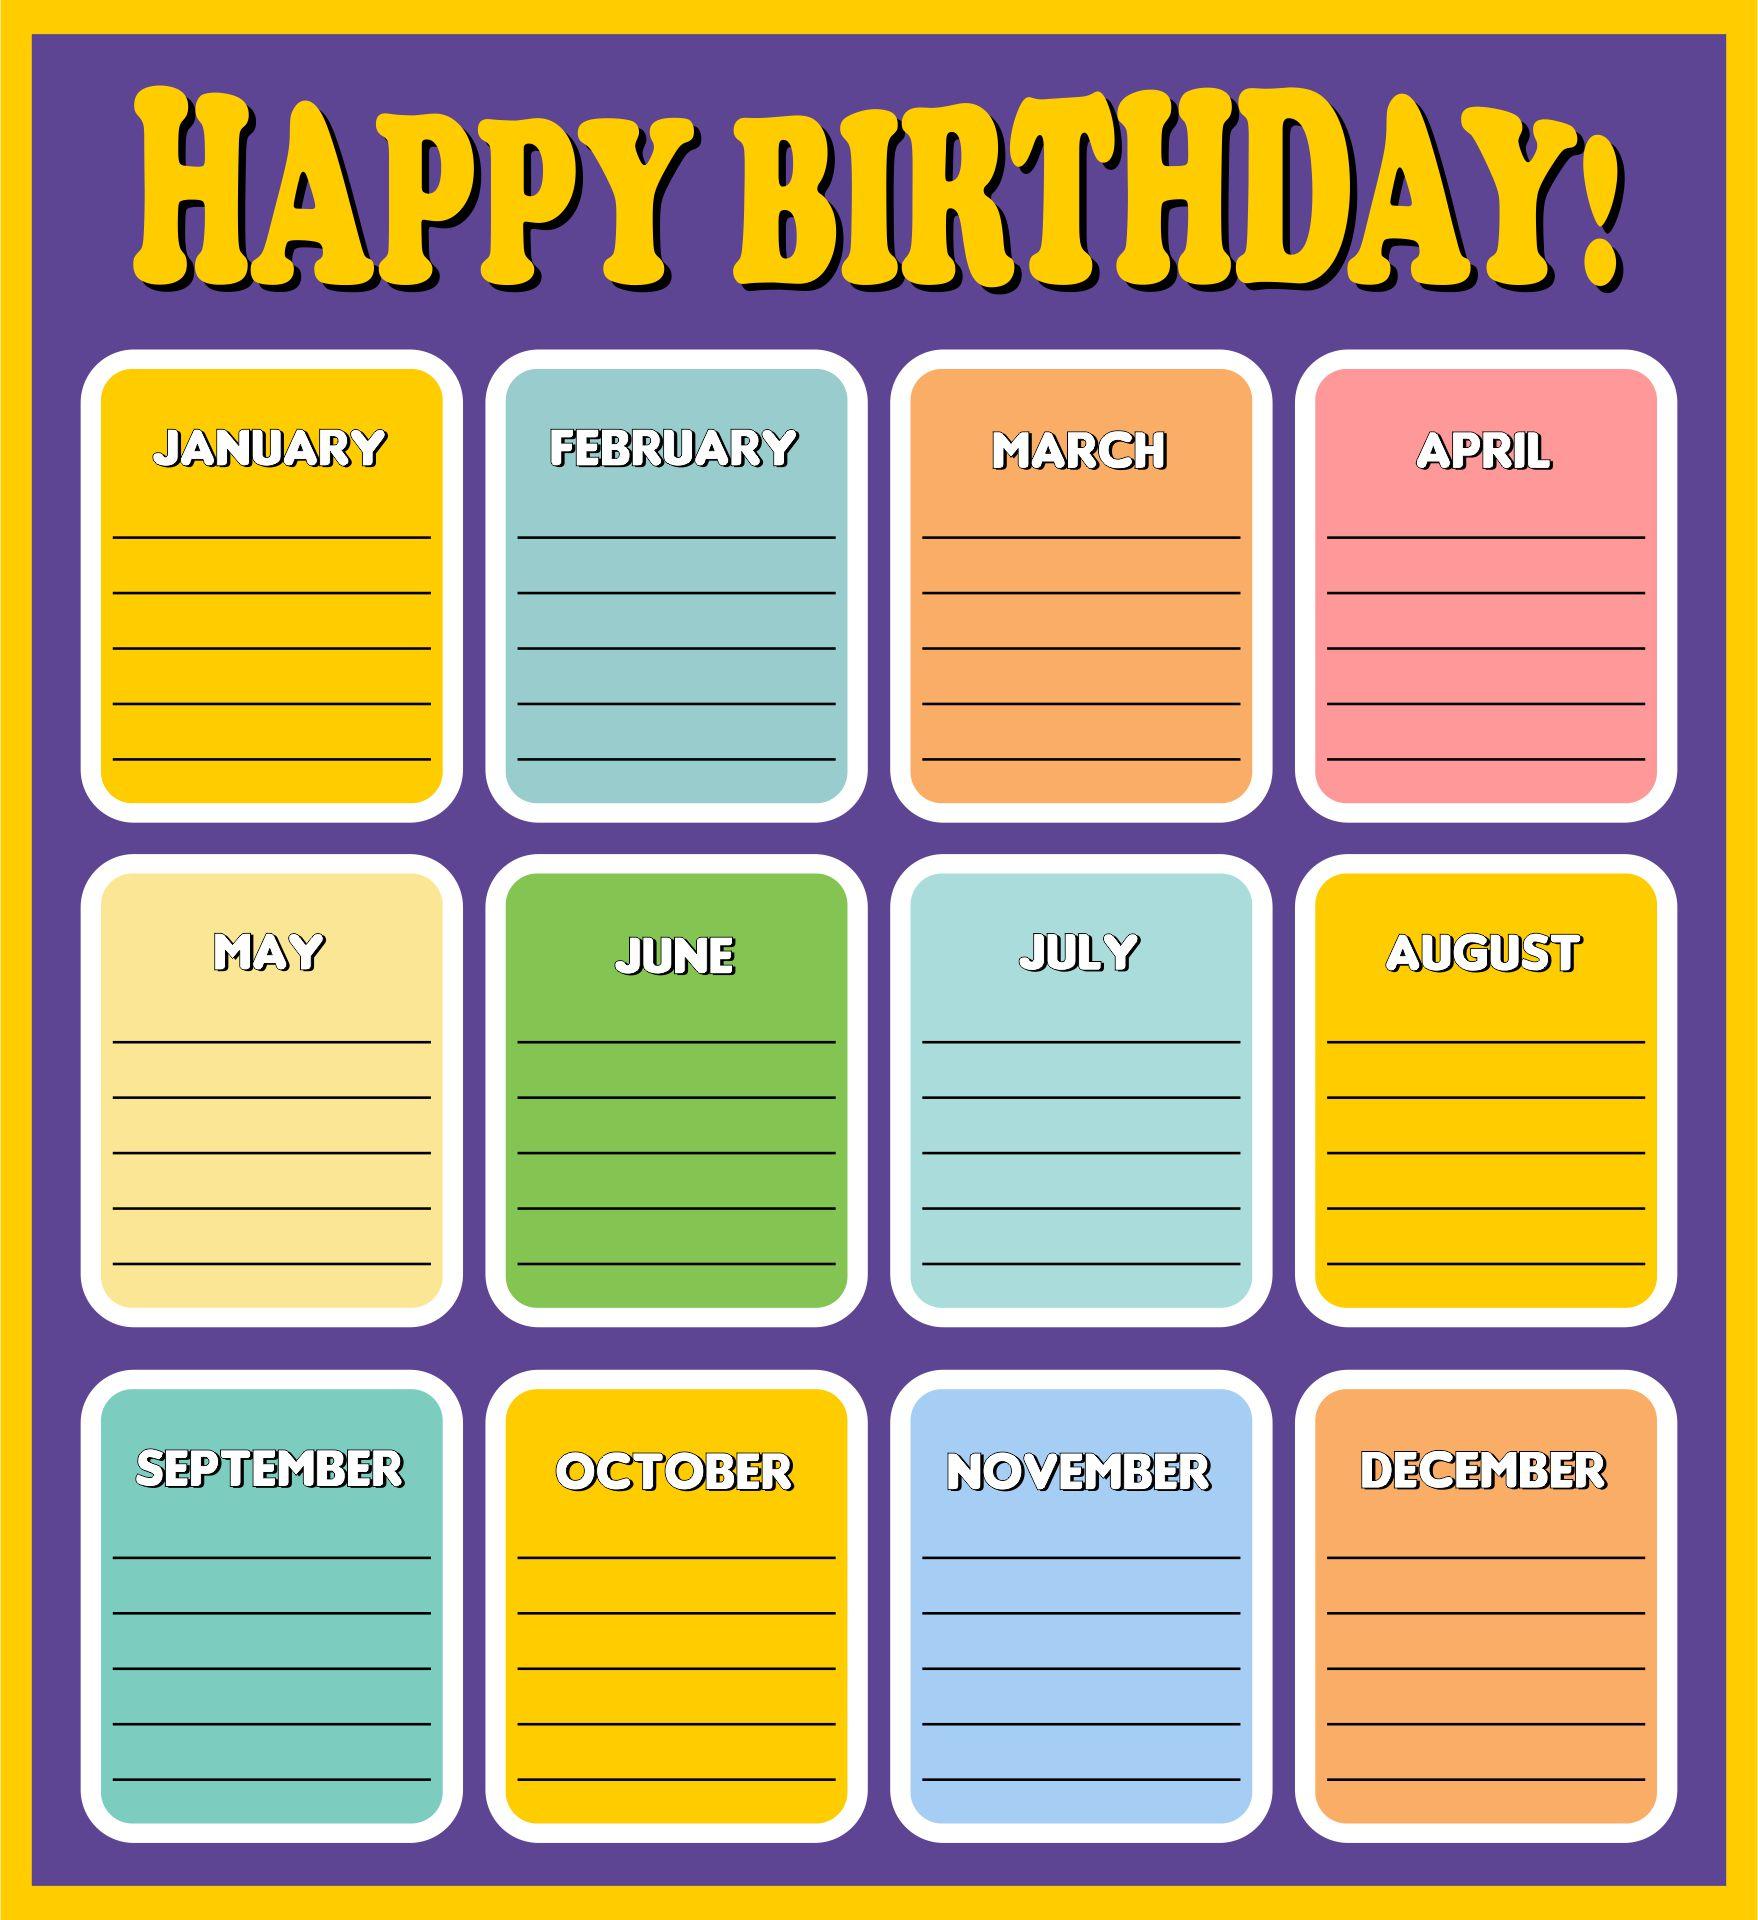 Preschool Happy Birthday Chart